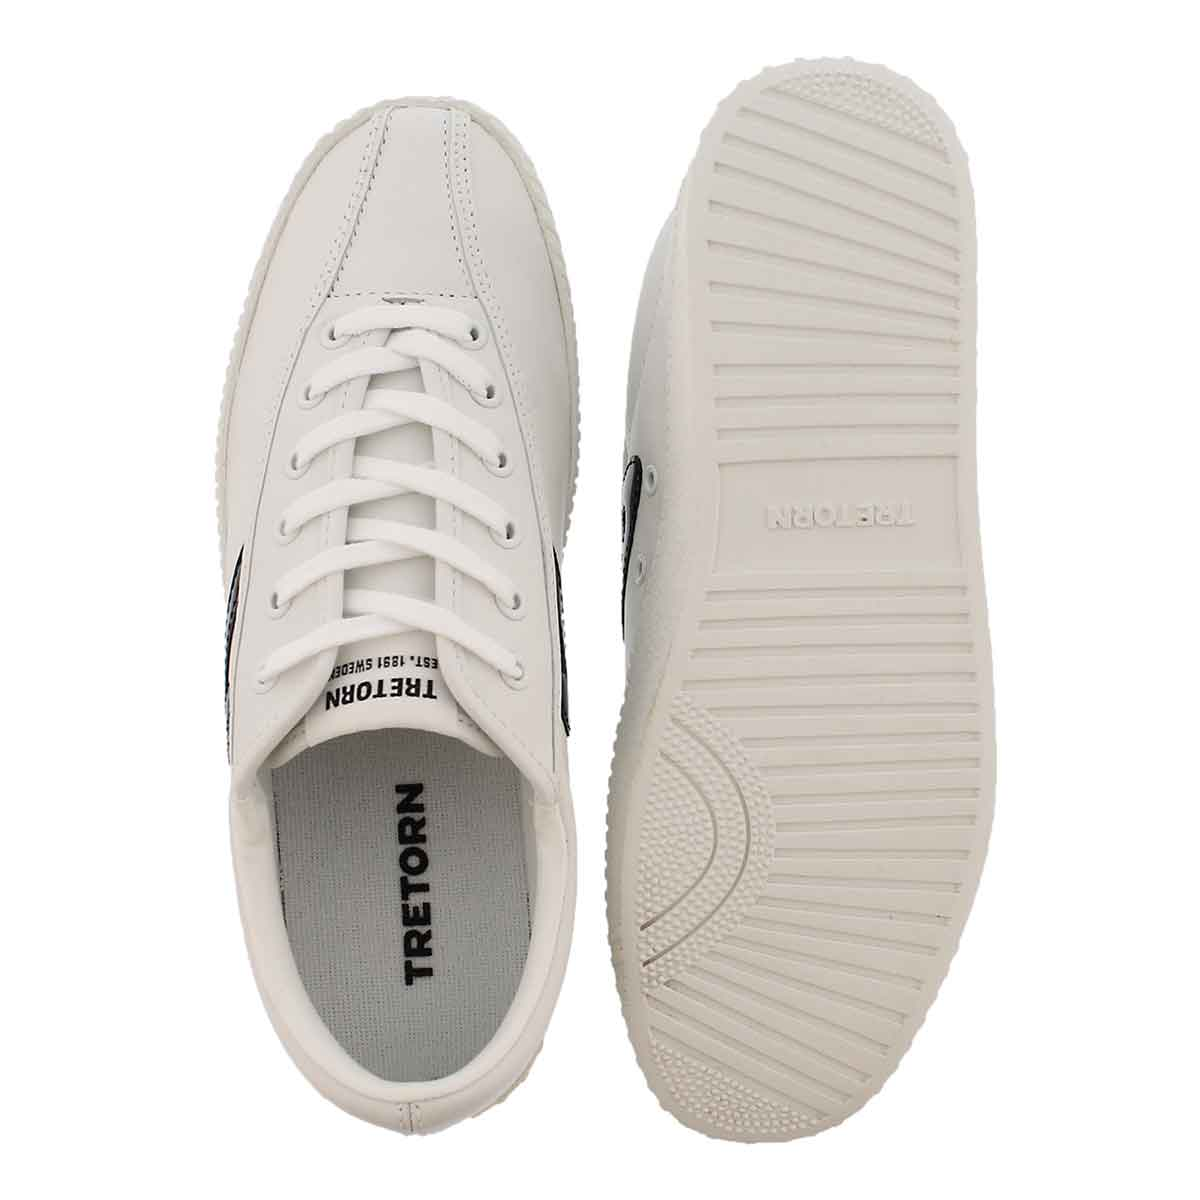 Lds Nylite 2 Bold white/black sneaker